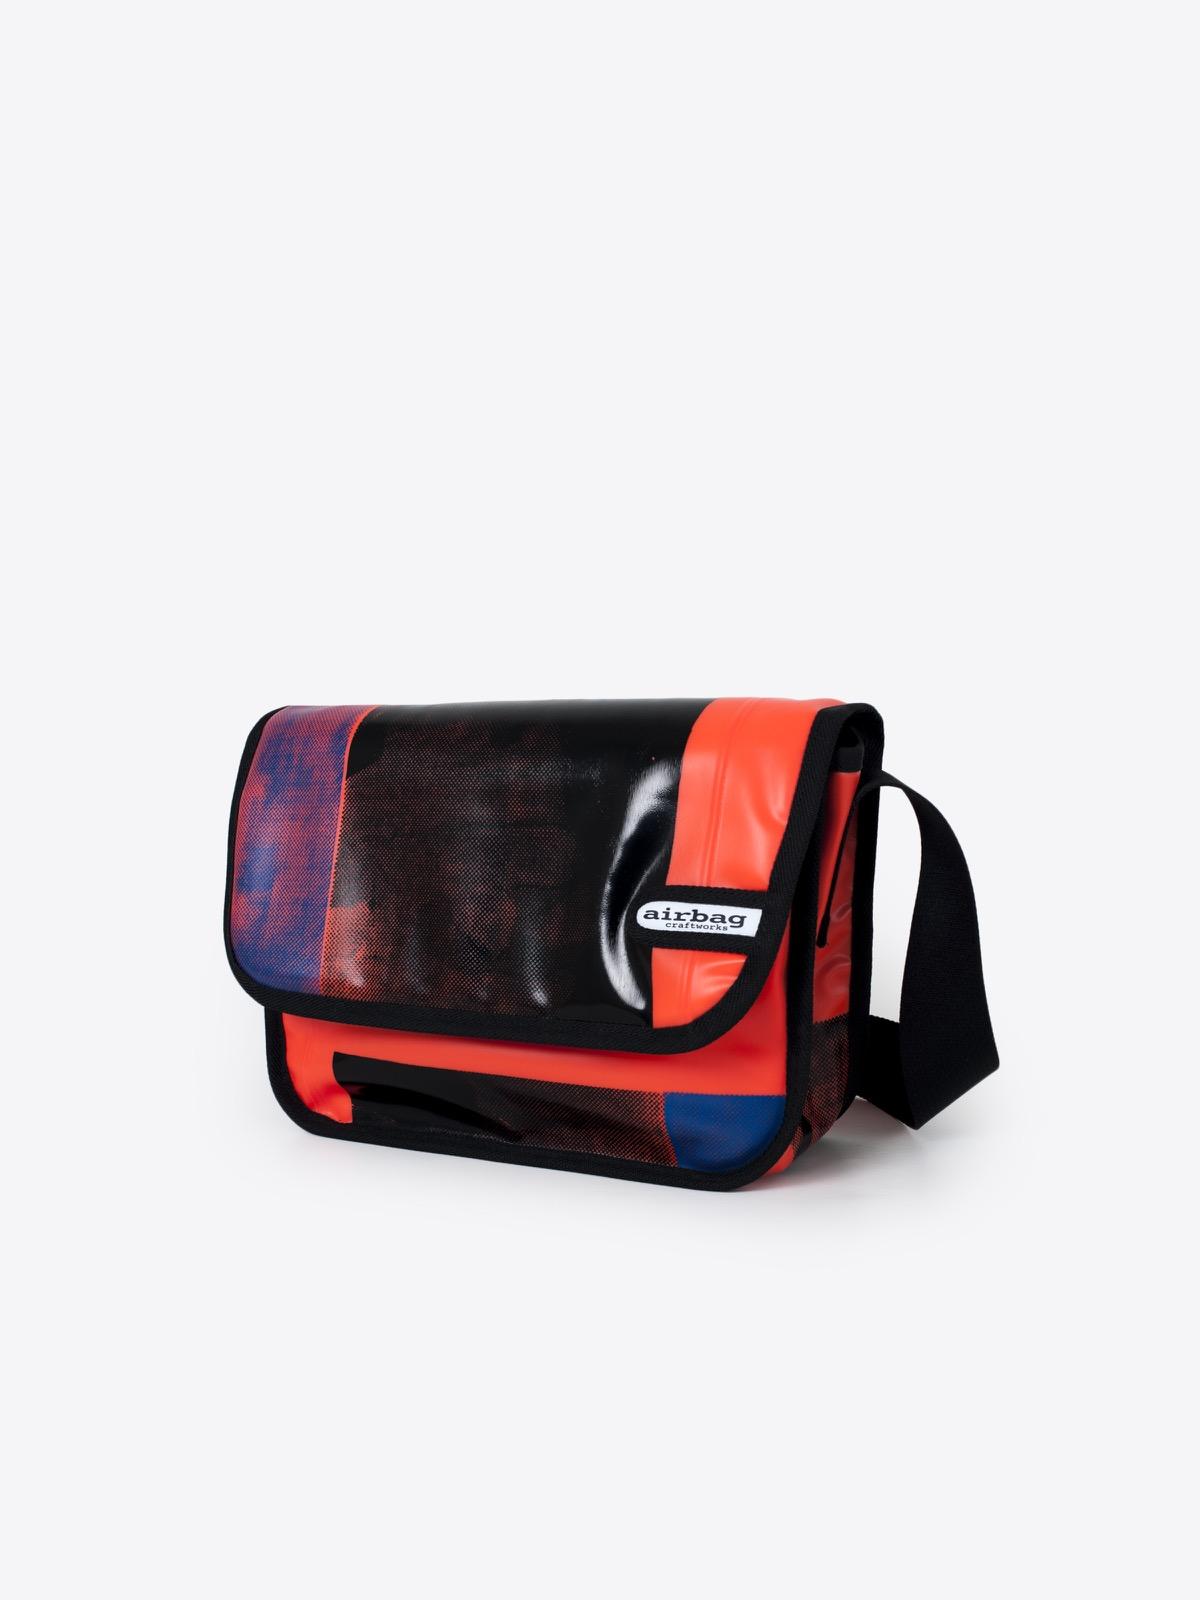 airbag craftworks 275